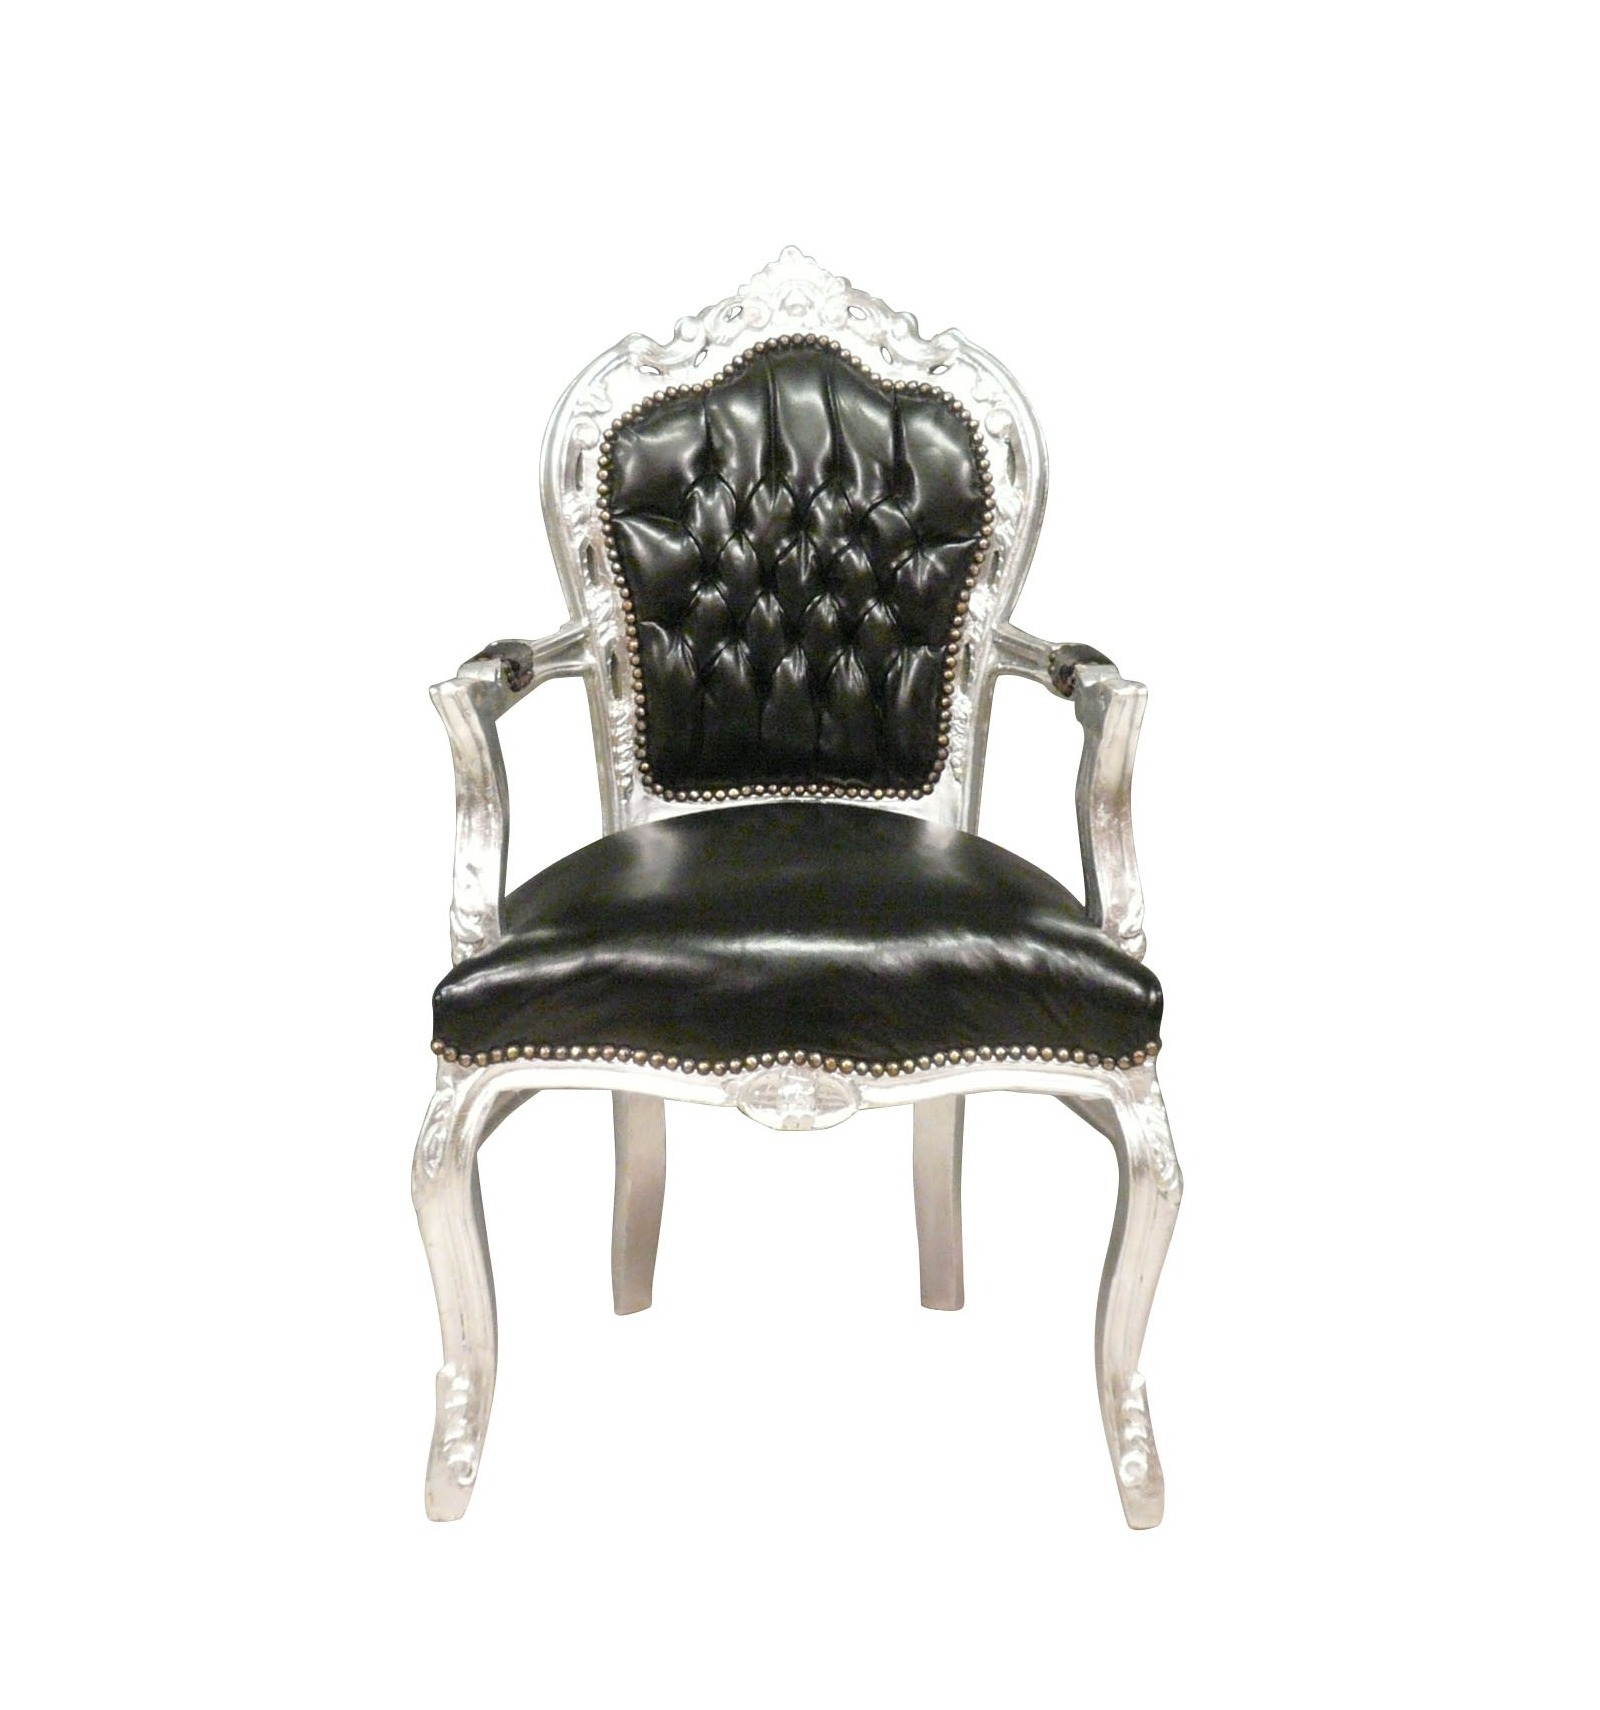 Barok Stoelen Zilver Zwart.Fauteuil Barok Zwart Zilver Faux Leather